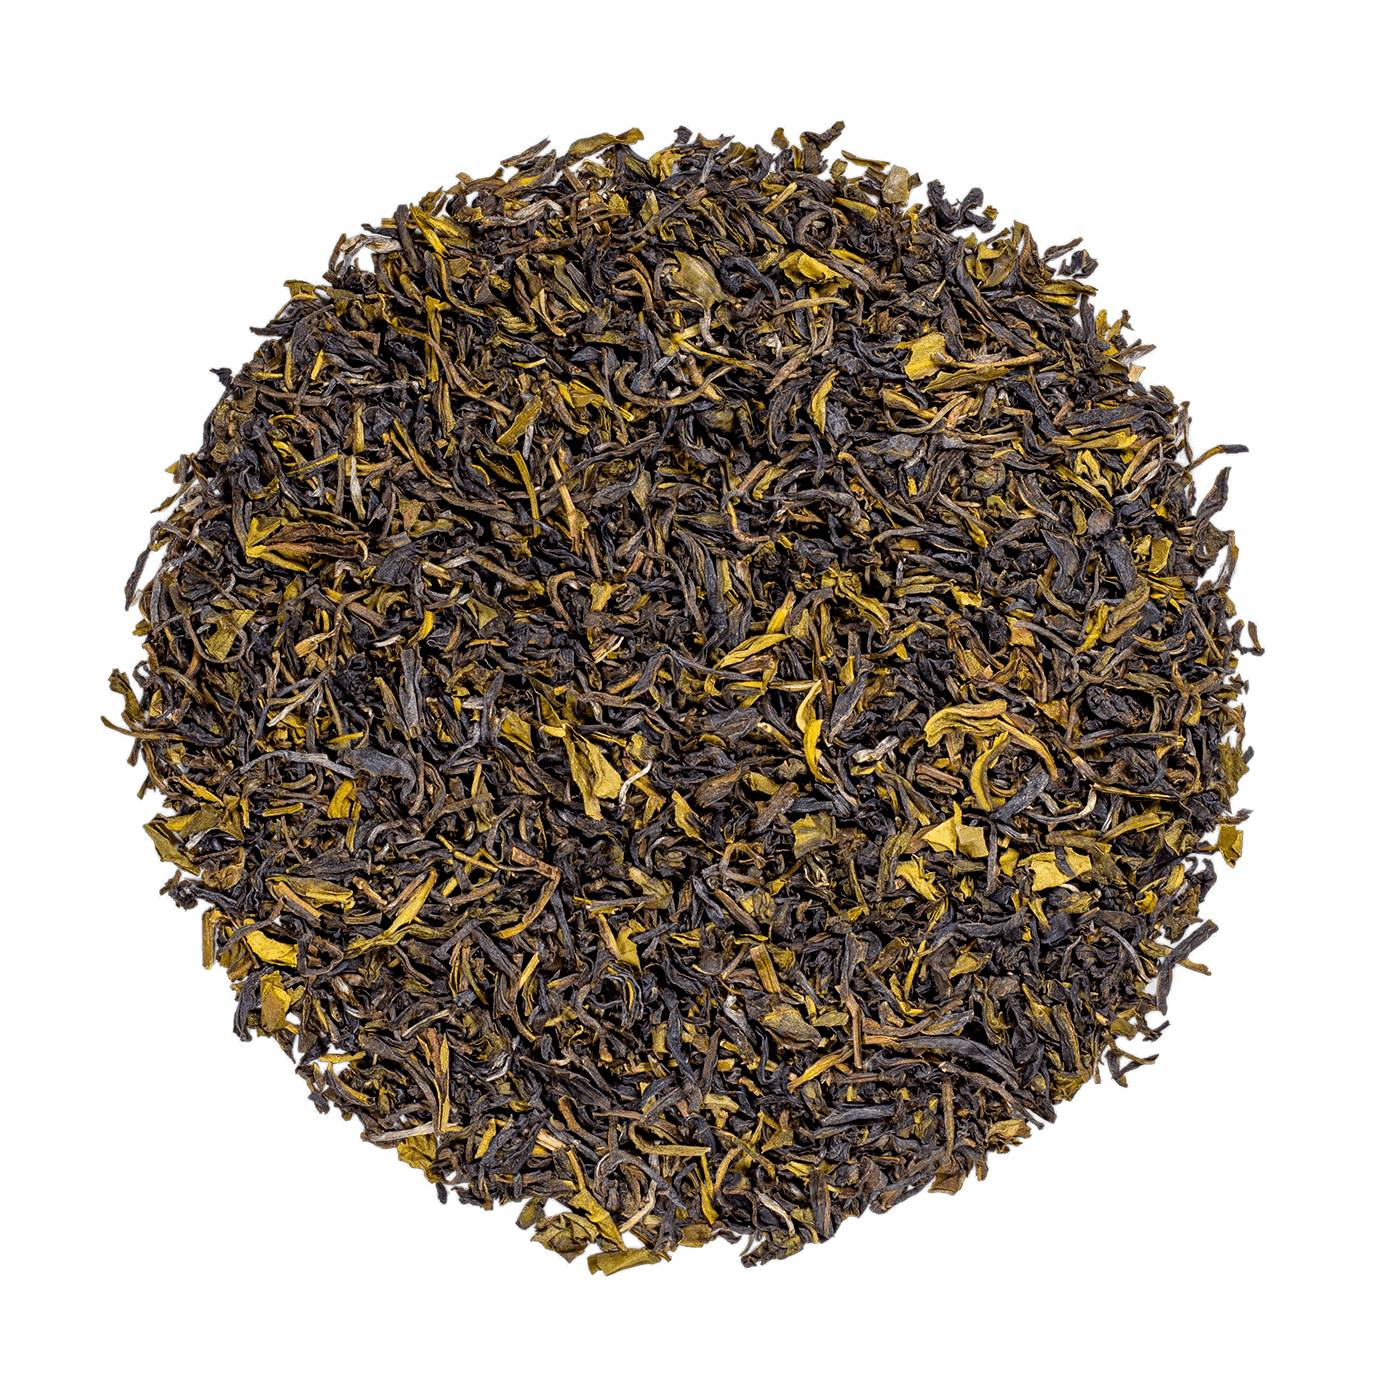 KUSMI TEA Darjeeling Vert bio - Thé vert d'Inde - Thé en vrac - Kusmi Tea